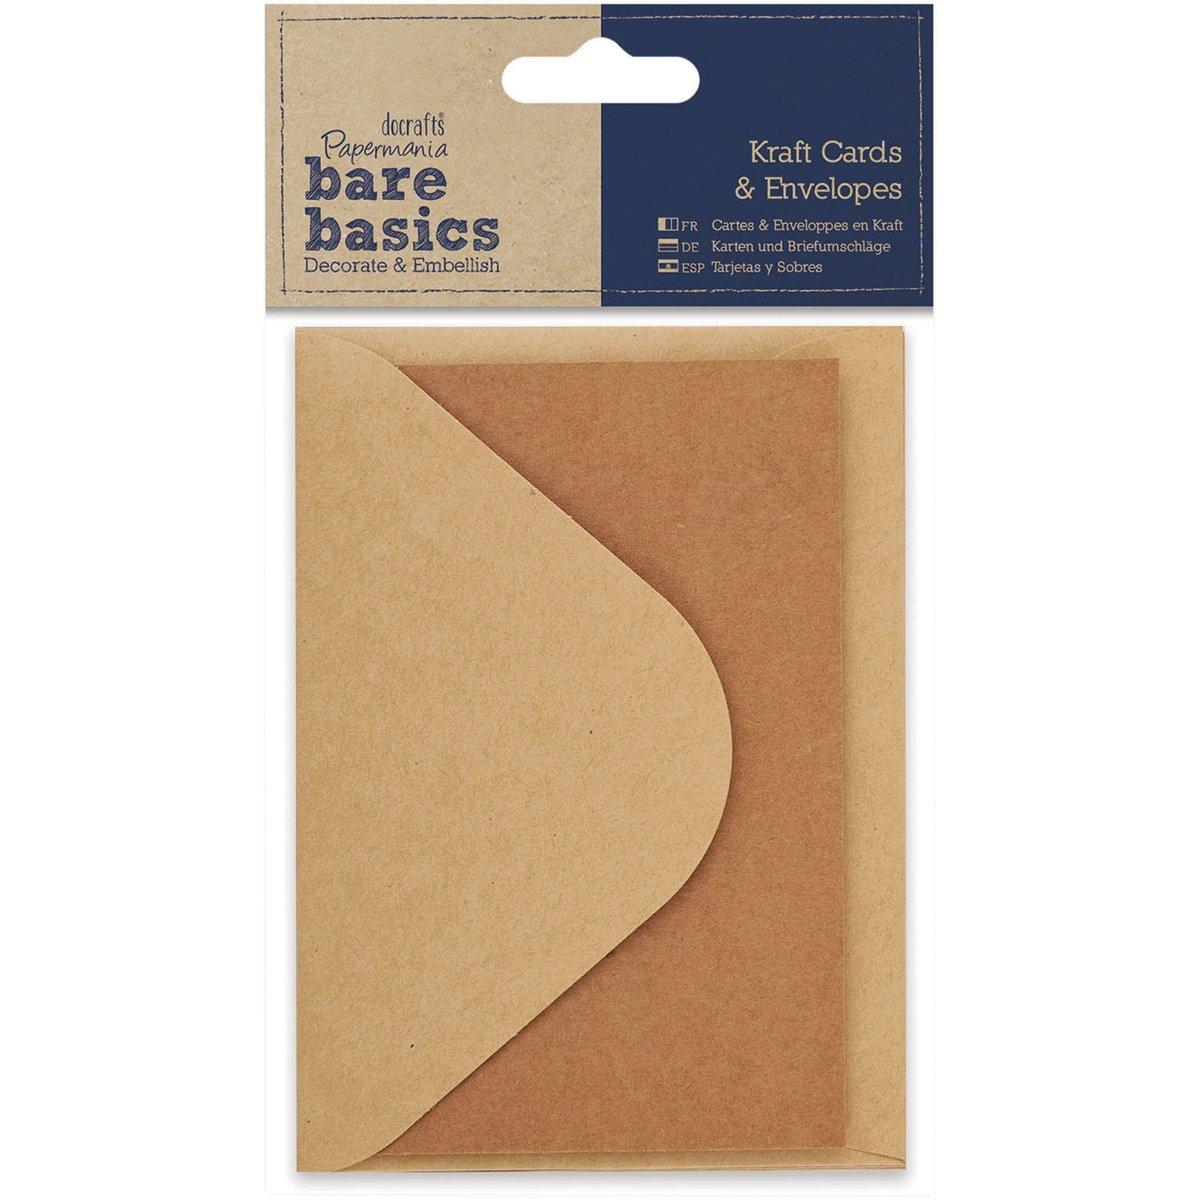 DOCrafts Papermania Bare Basics Cards and Envelopes Kraft